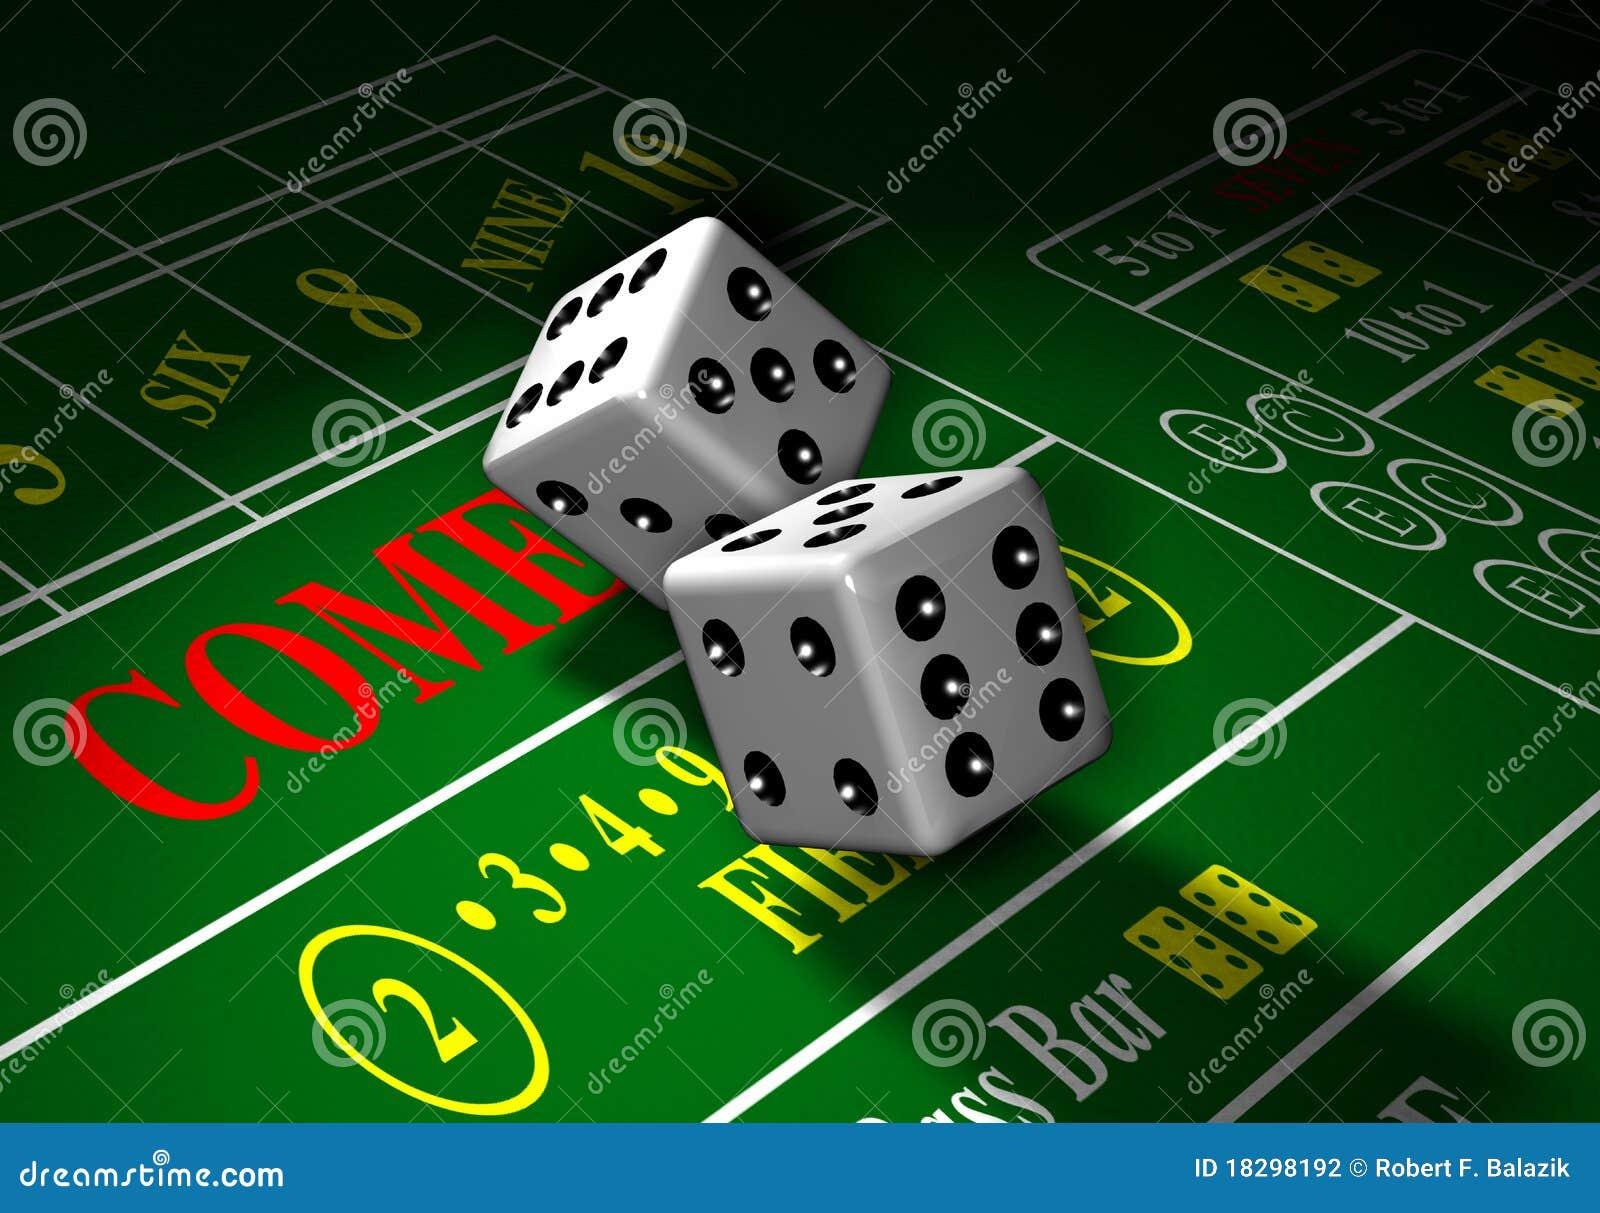 New casino free spins